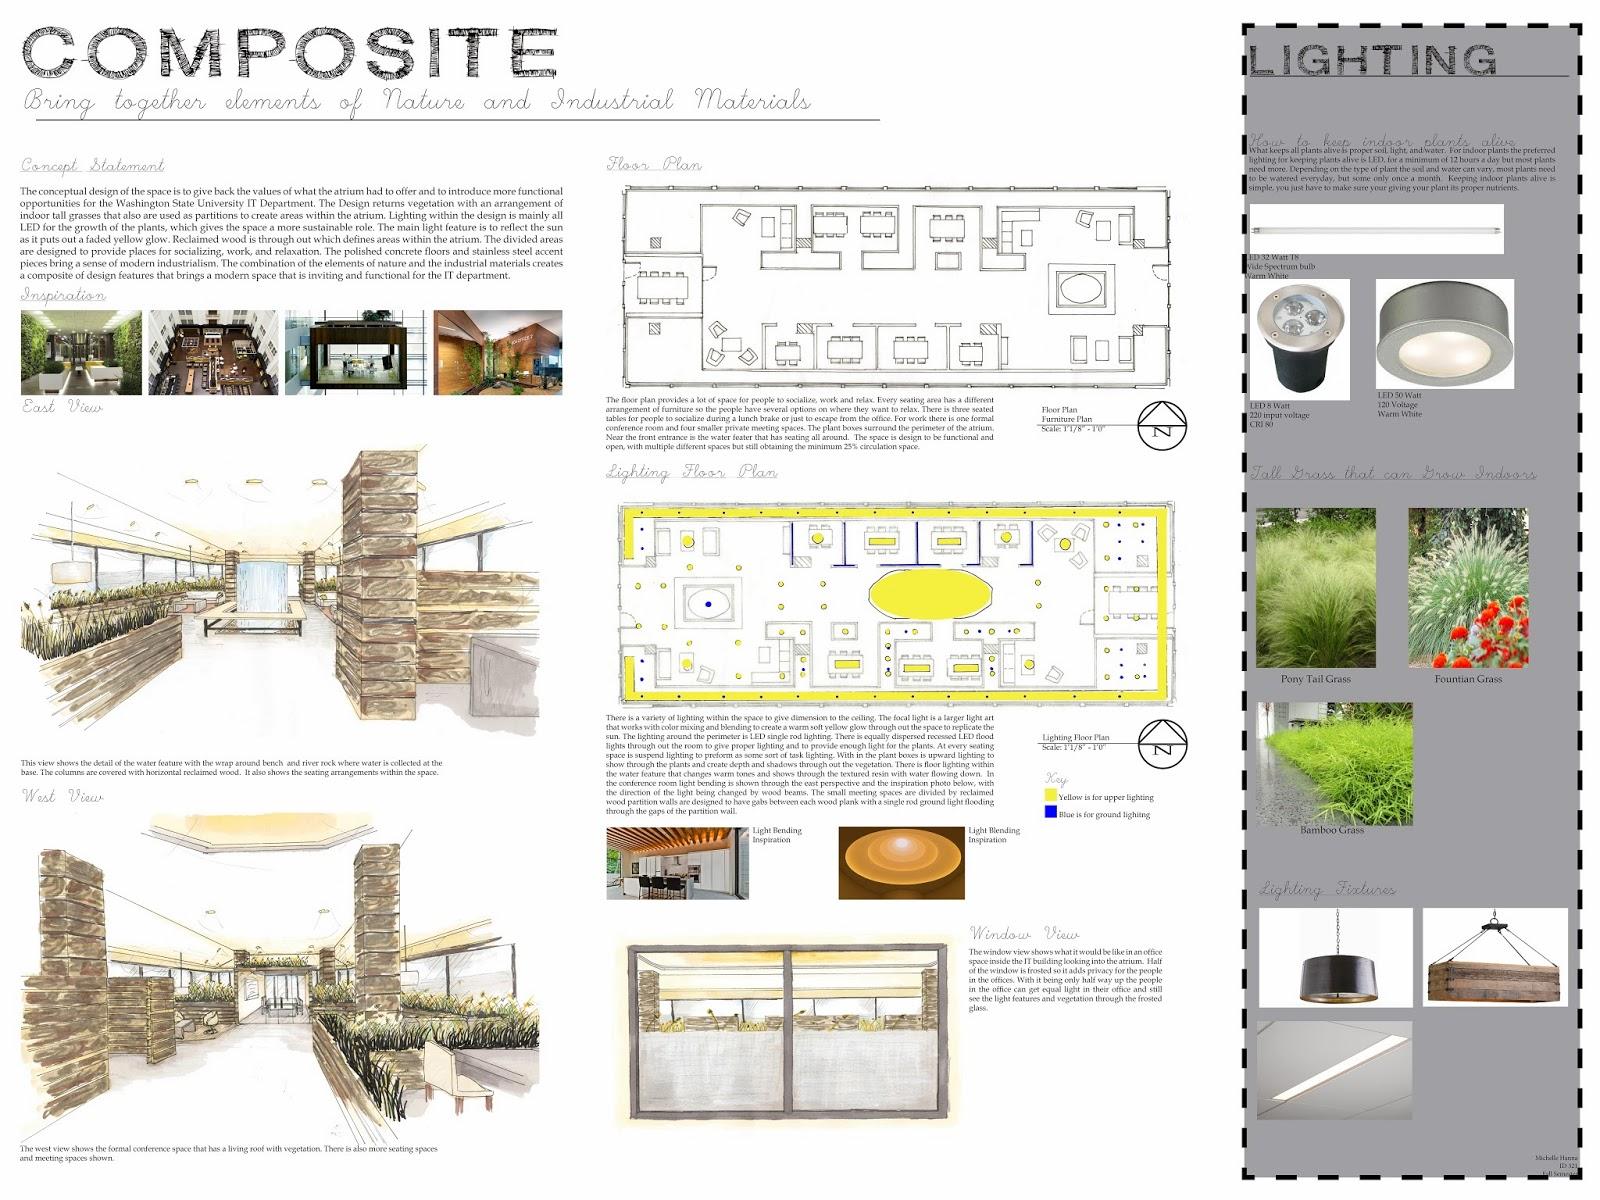 wsu it building design - Wsu Interior Design